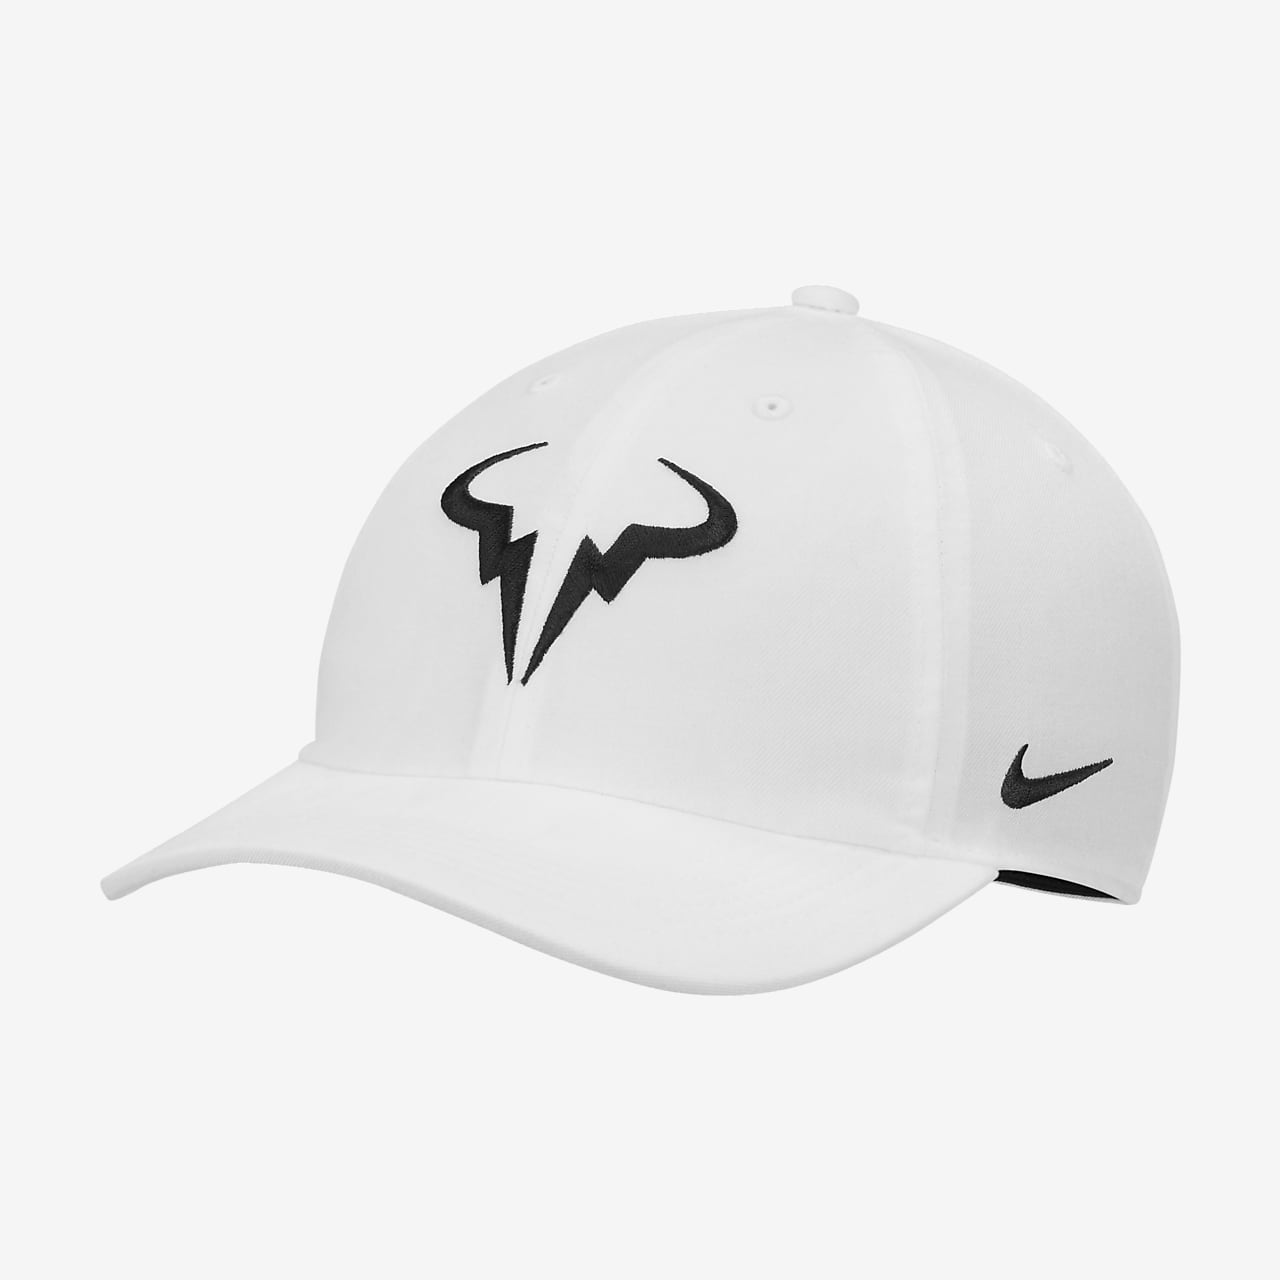 daf65f52 NikeCourt AeroBill Rafa Heritage86 Tennis Hat. Nike.com